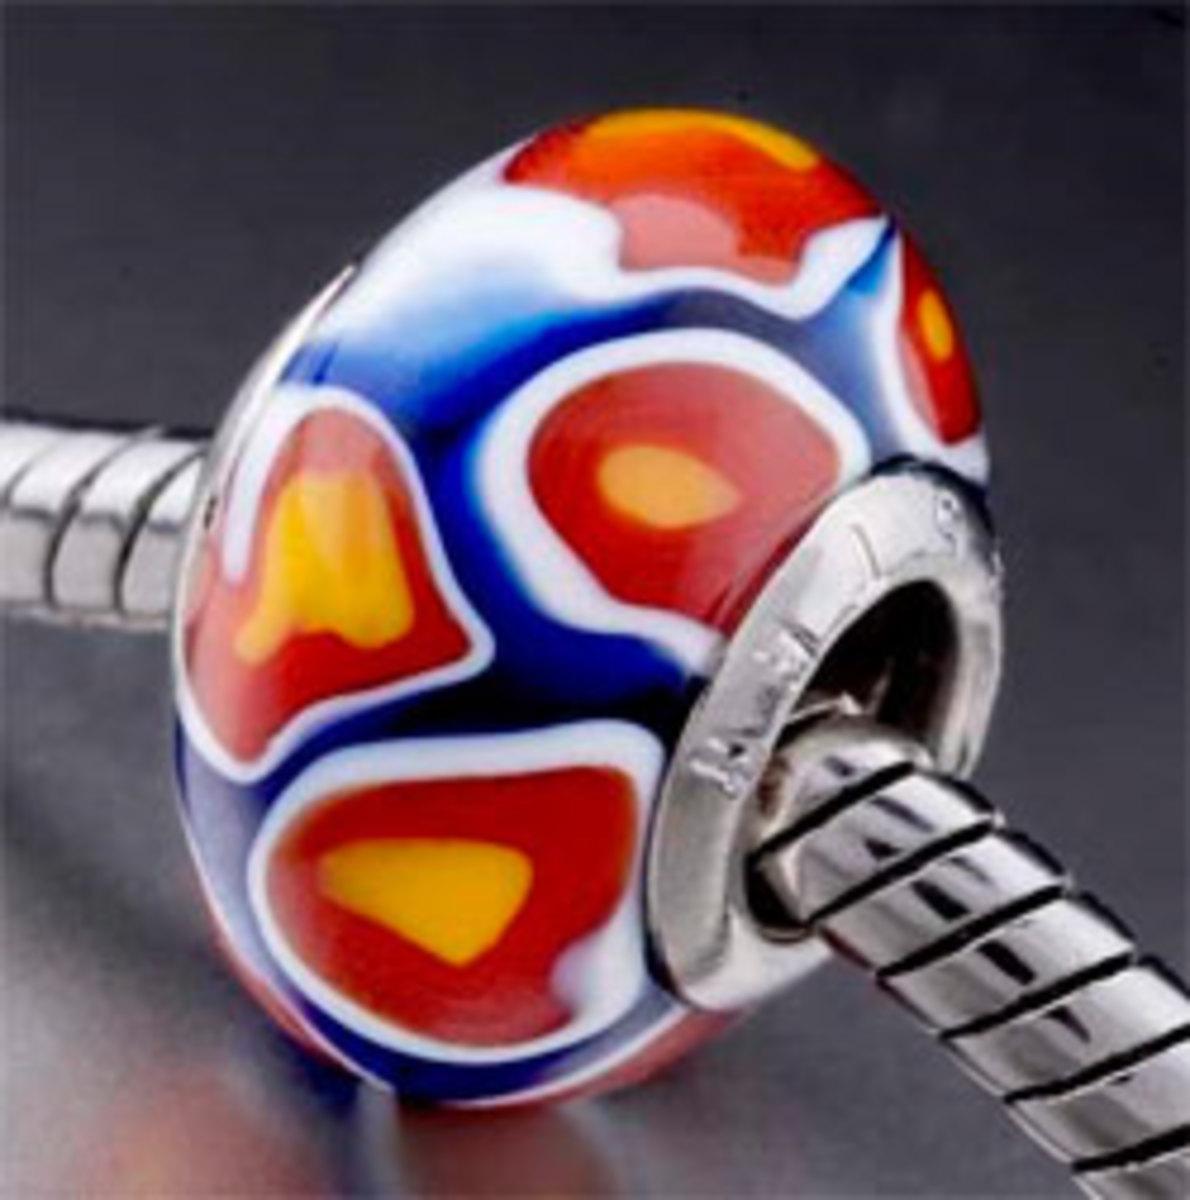 Buy Pandora beads online - like this handmade Murano glass bead from Amazon, created to fit a Pandora charm bracelet - stunning!